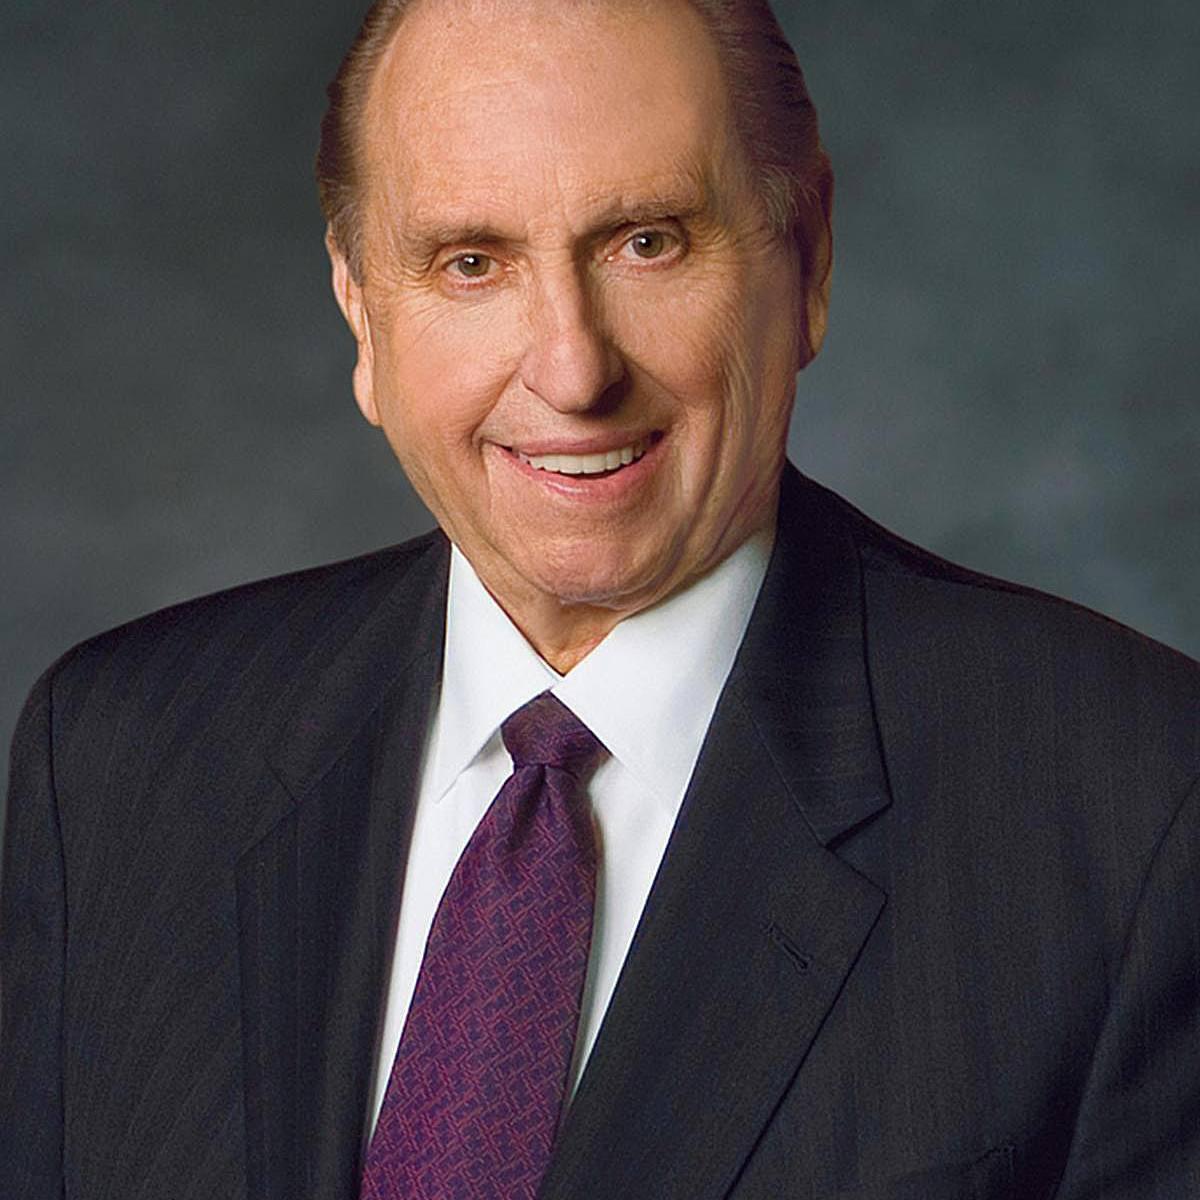 Church president Thomas S. Monson.